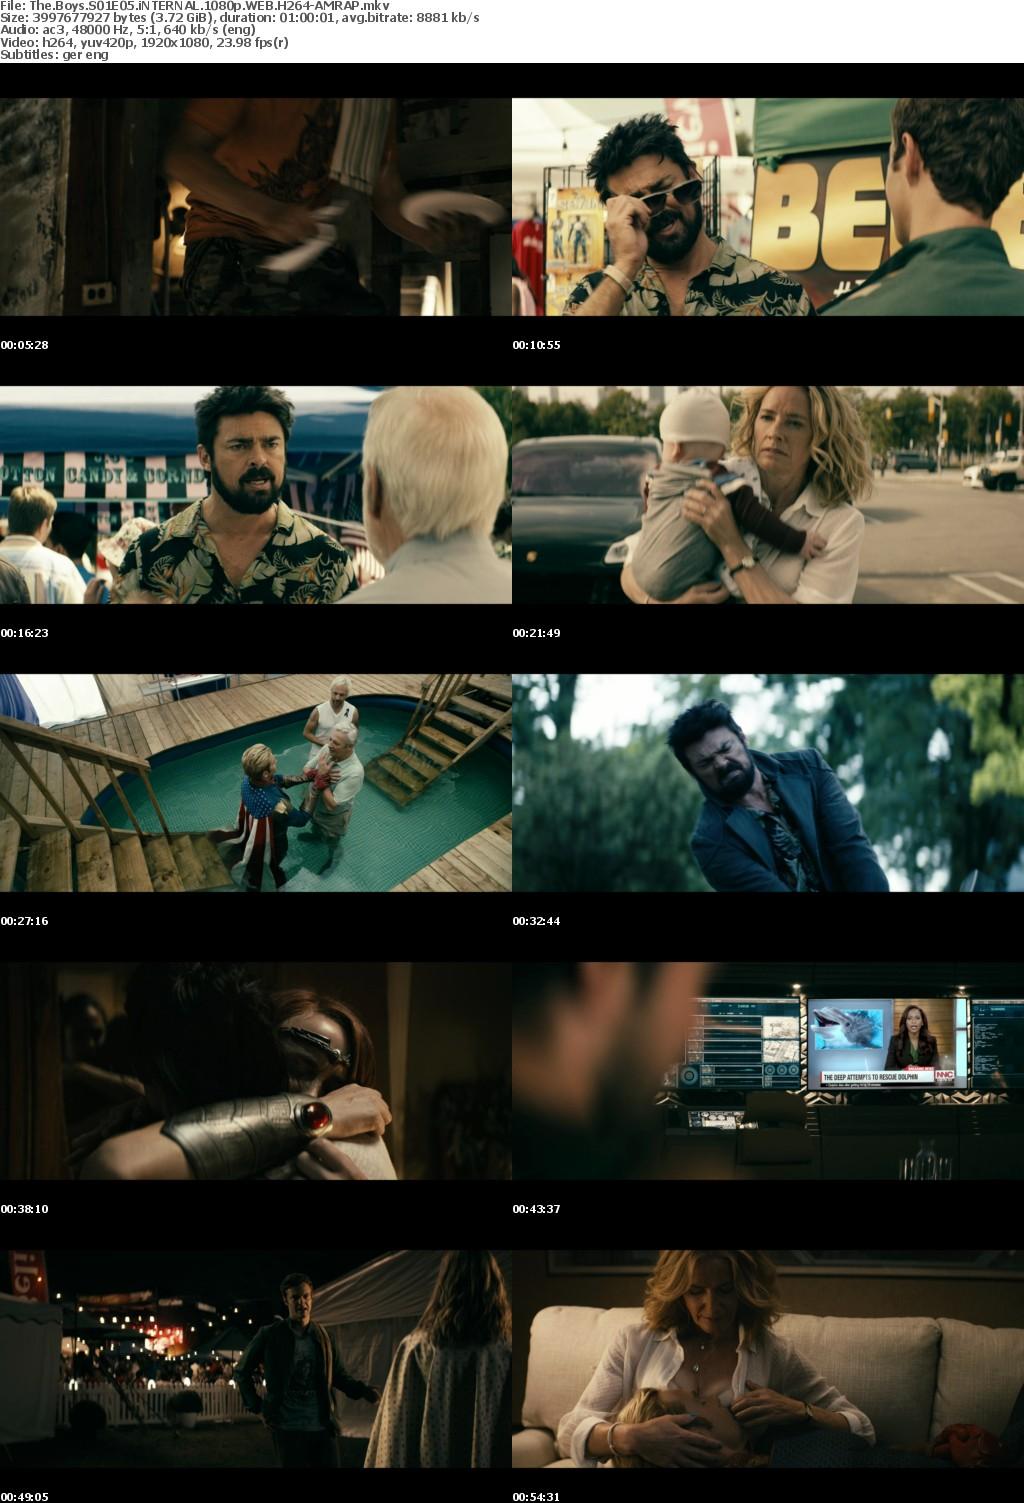 The Boys S01E05 iNTERNAL 1080p WEB H264-AMRAP